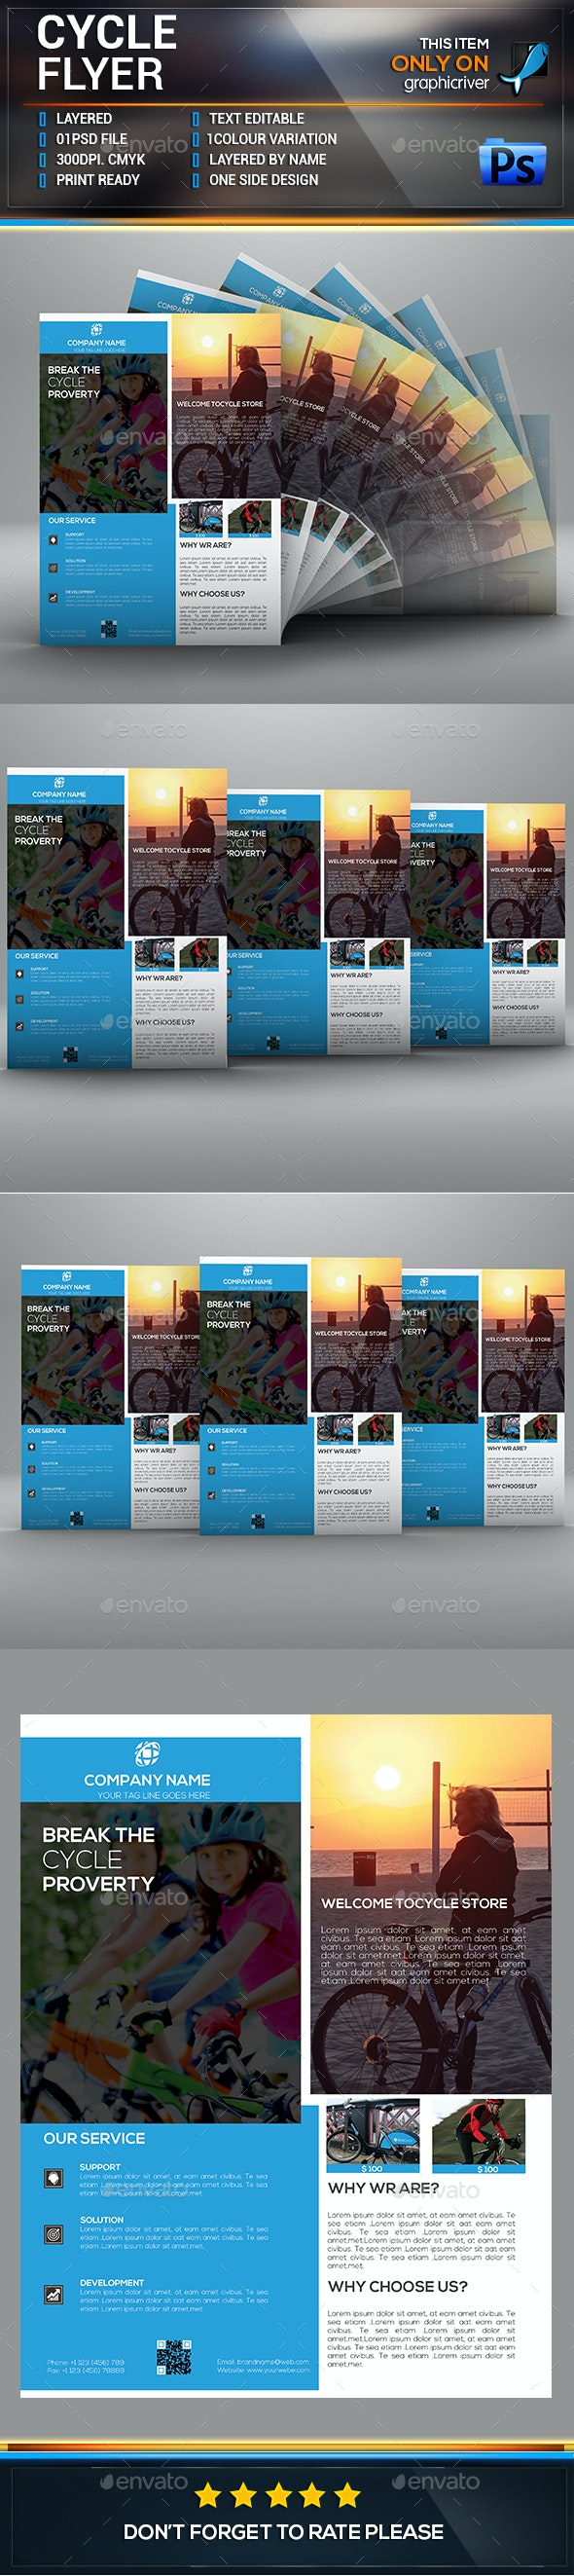 Cycle Flyer. - Flyers Print Templates